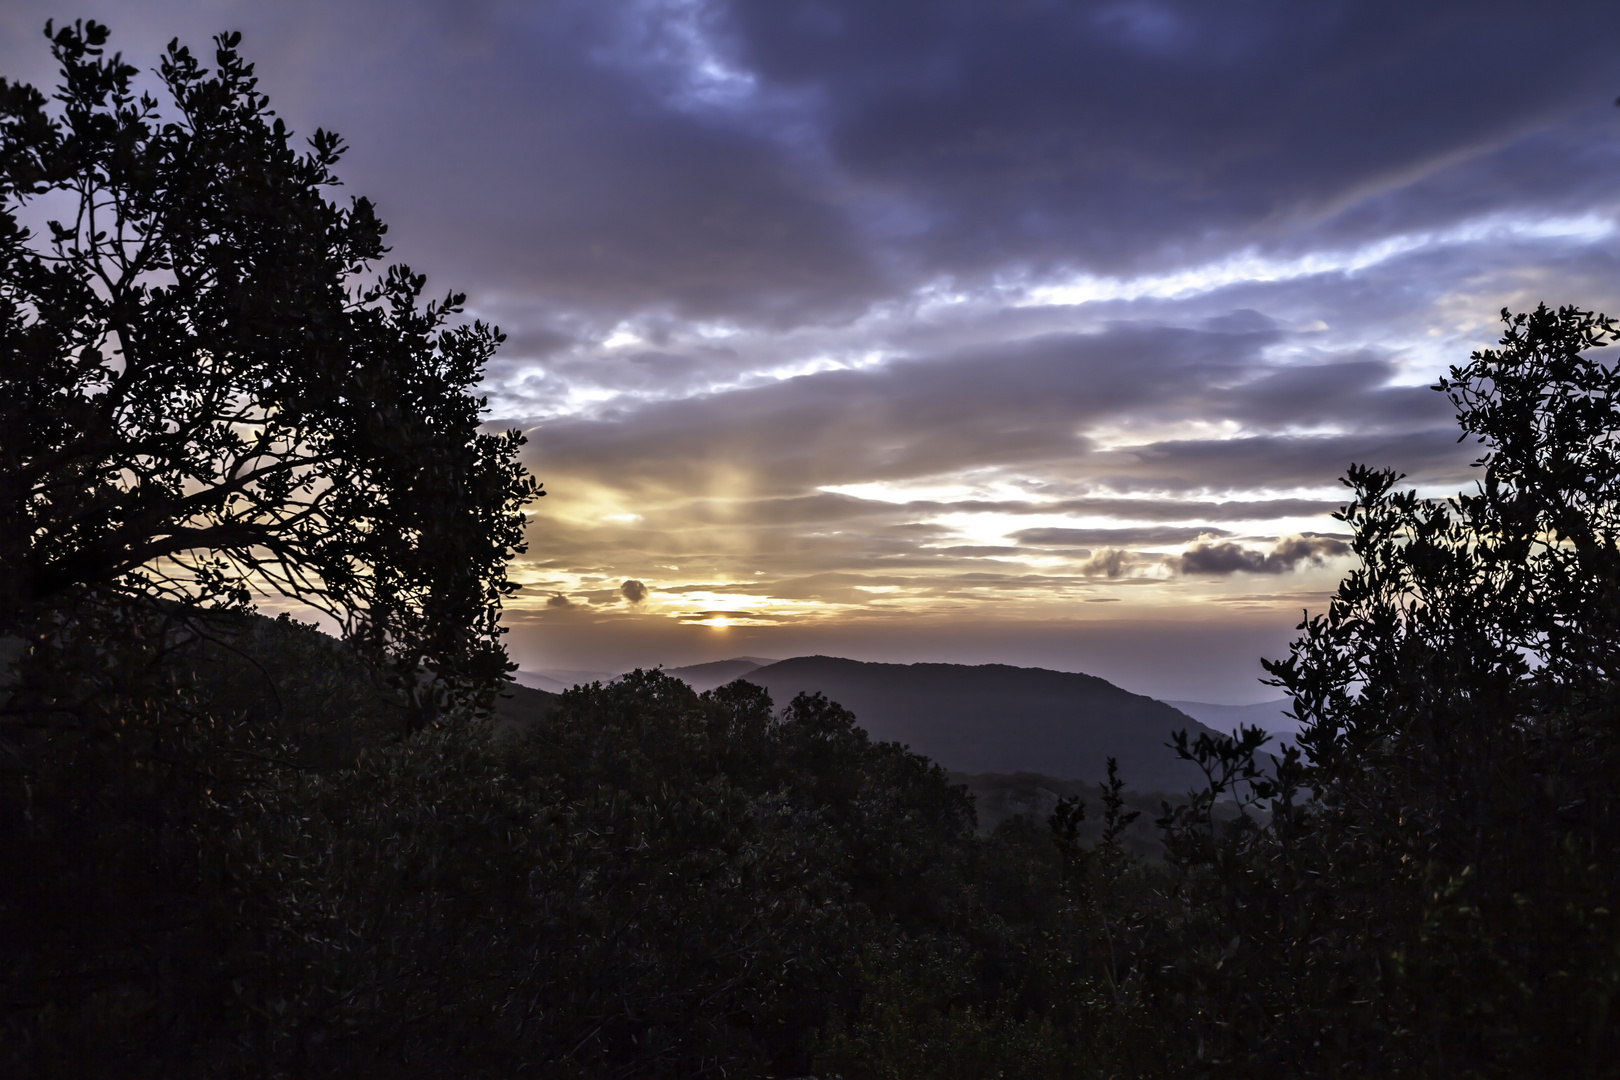 Sonnenaufgang an der Cote d'Azur